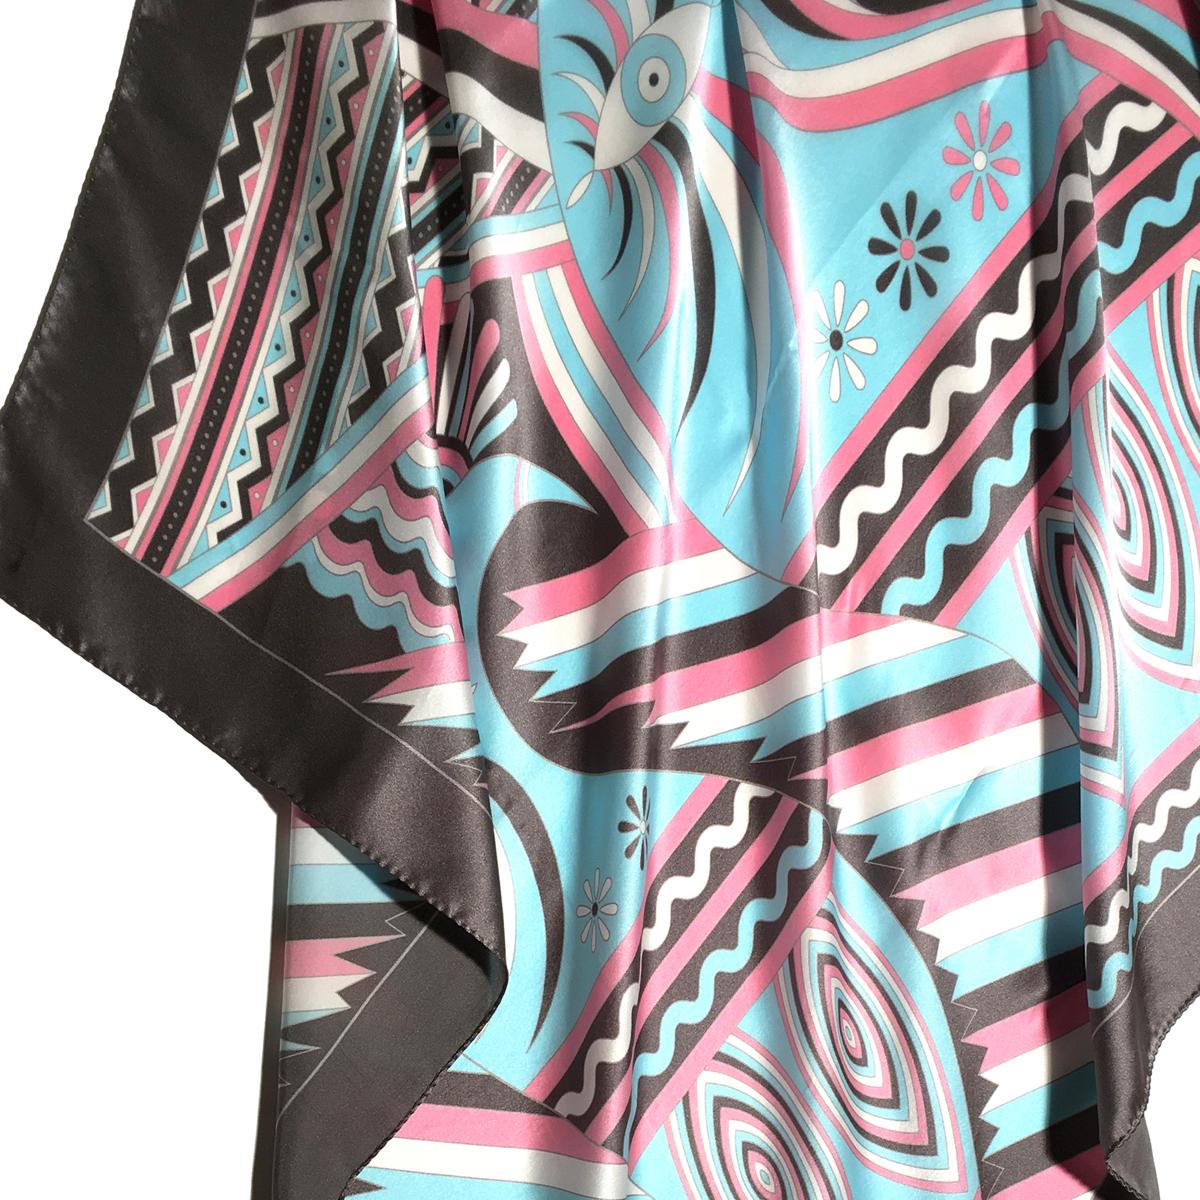 90x90cm Classic Square Scarf 100% Silk